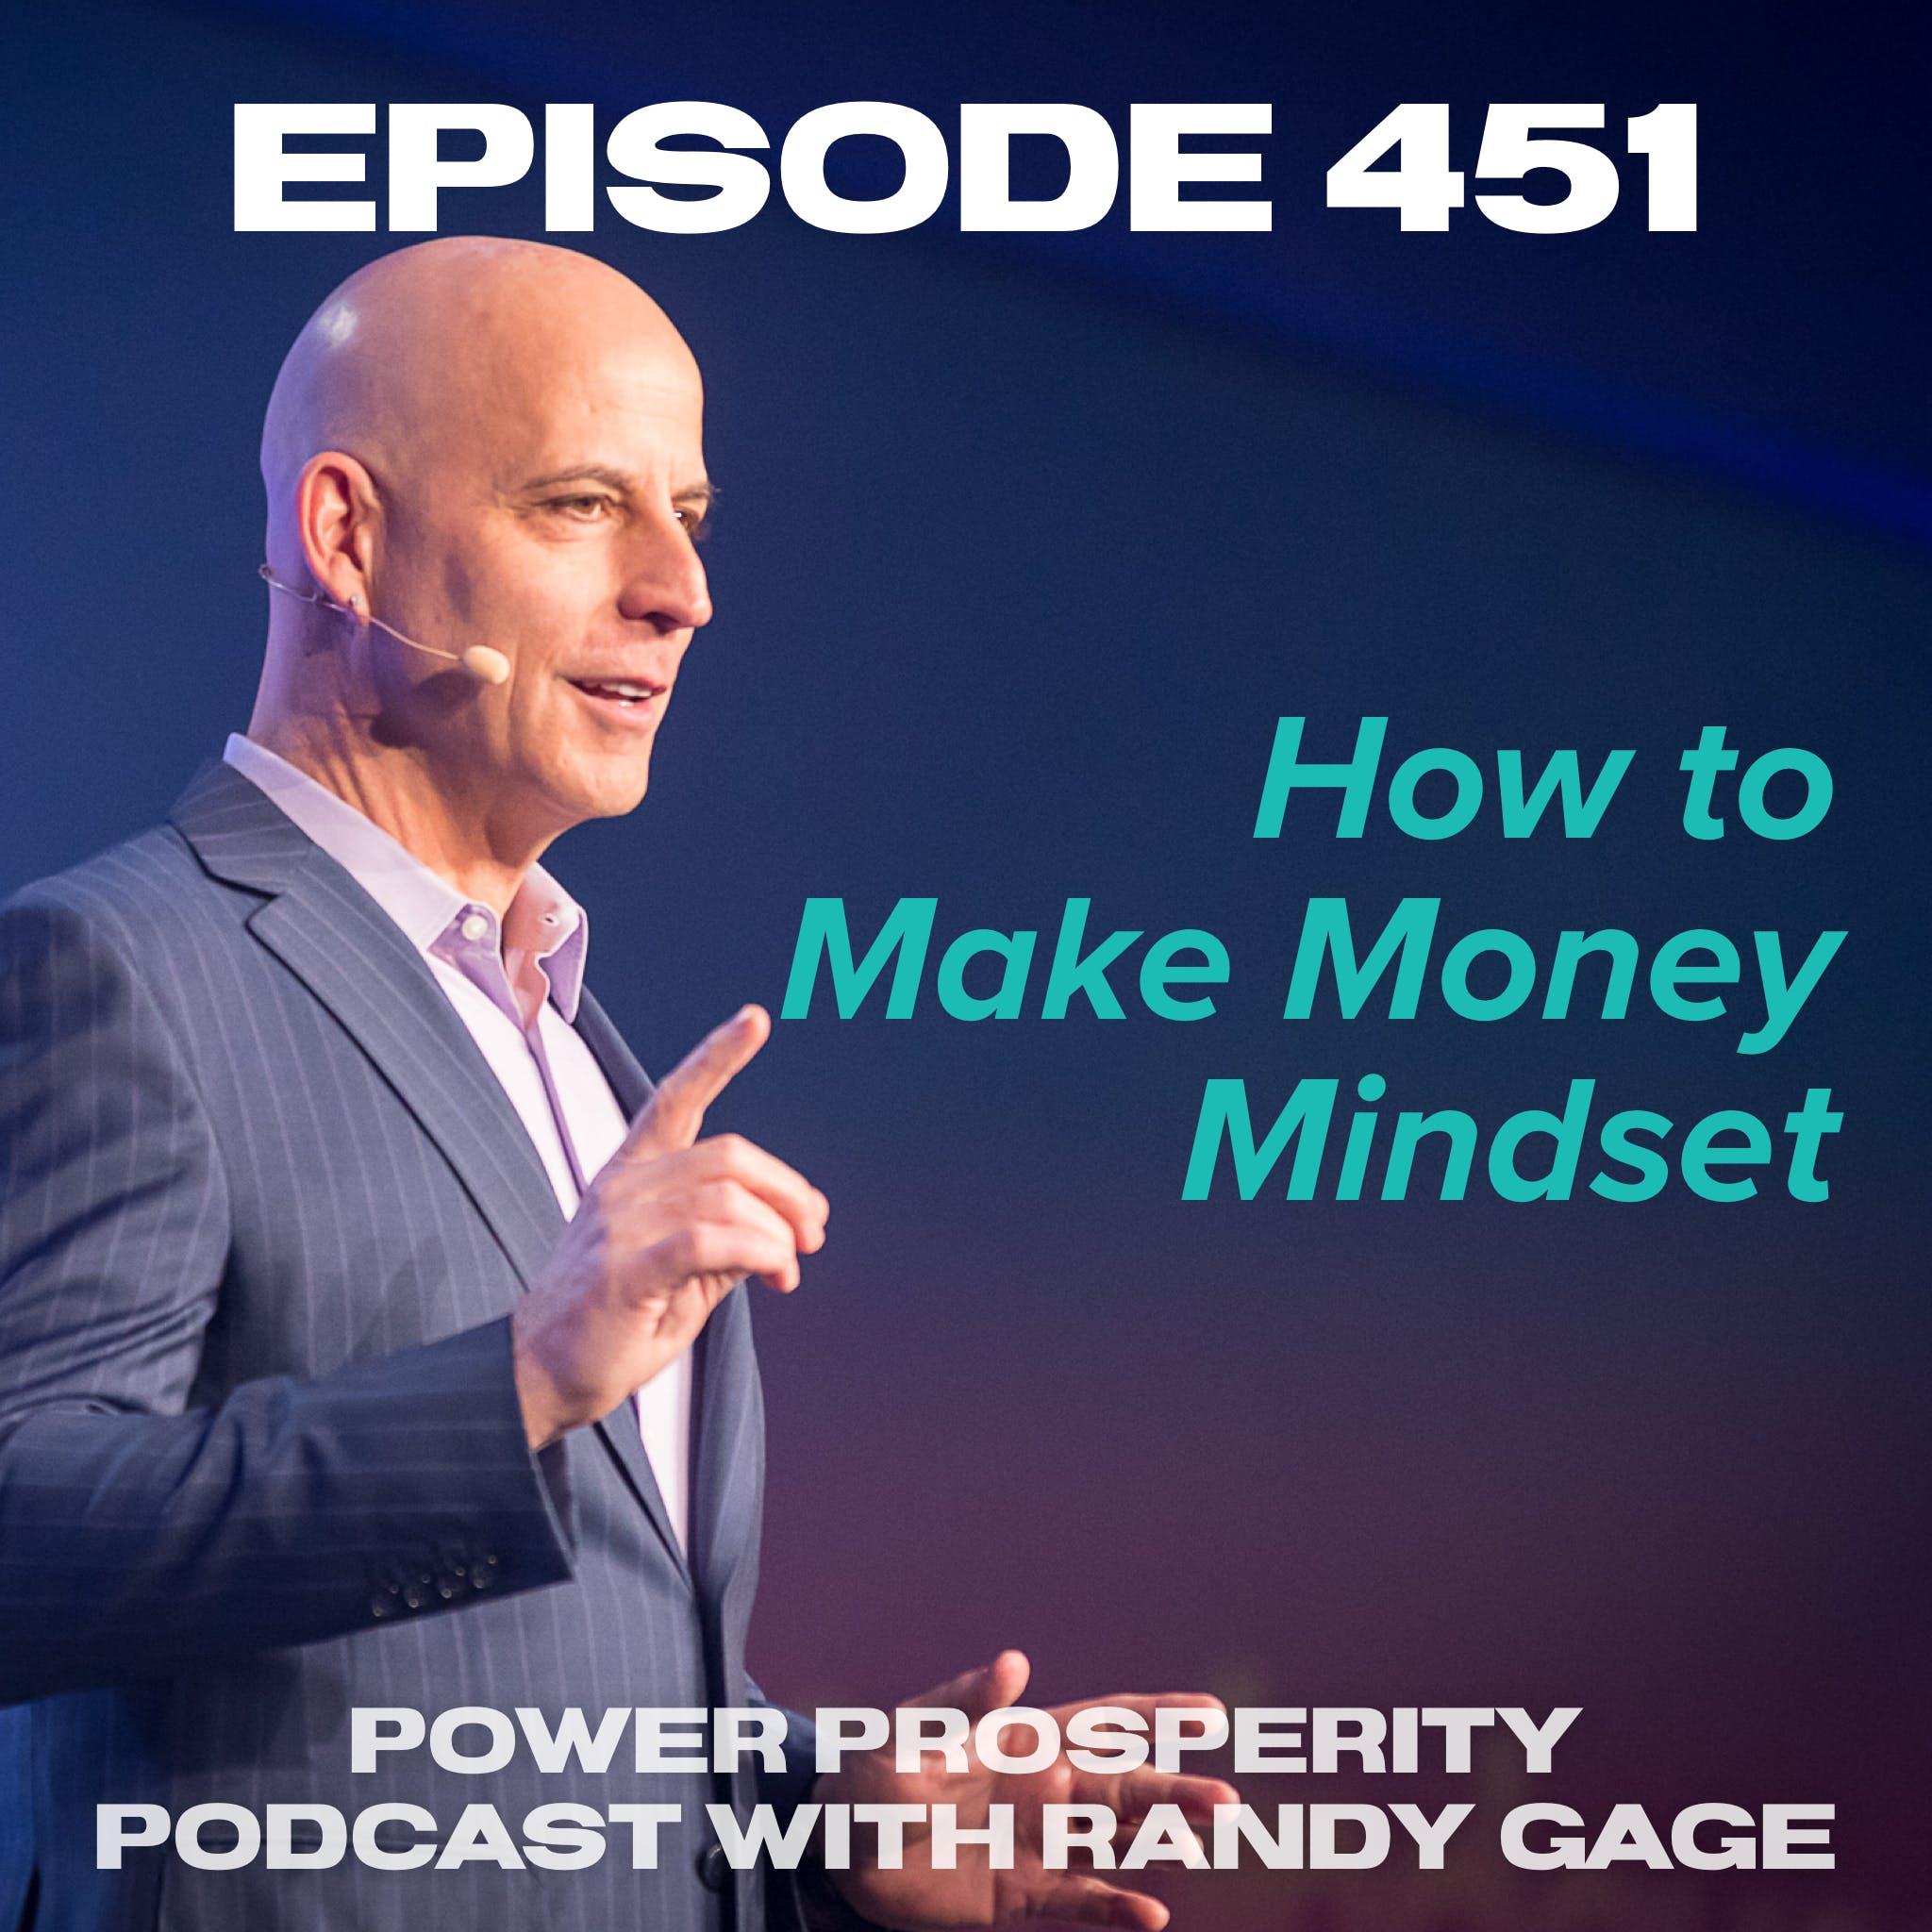 Episode 451: How to Make Money Mindset